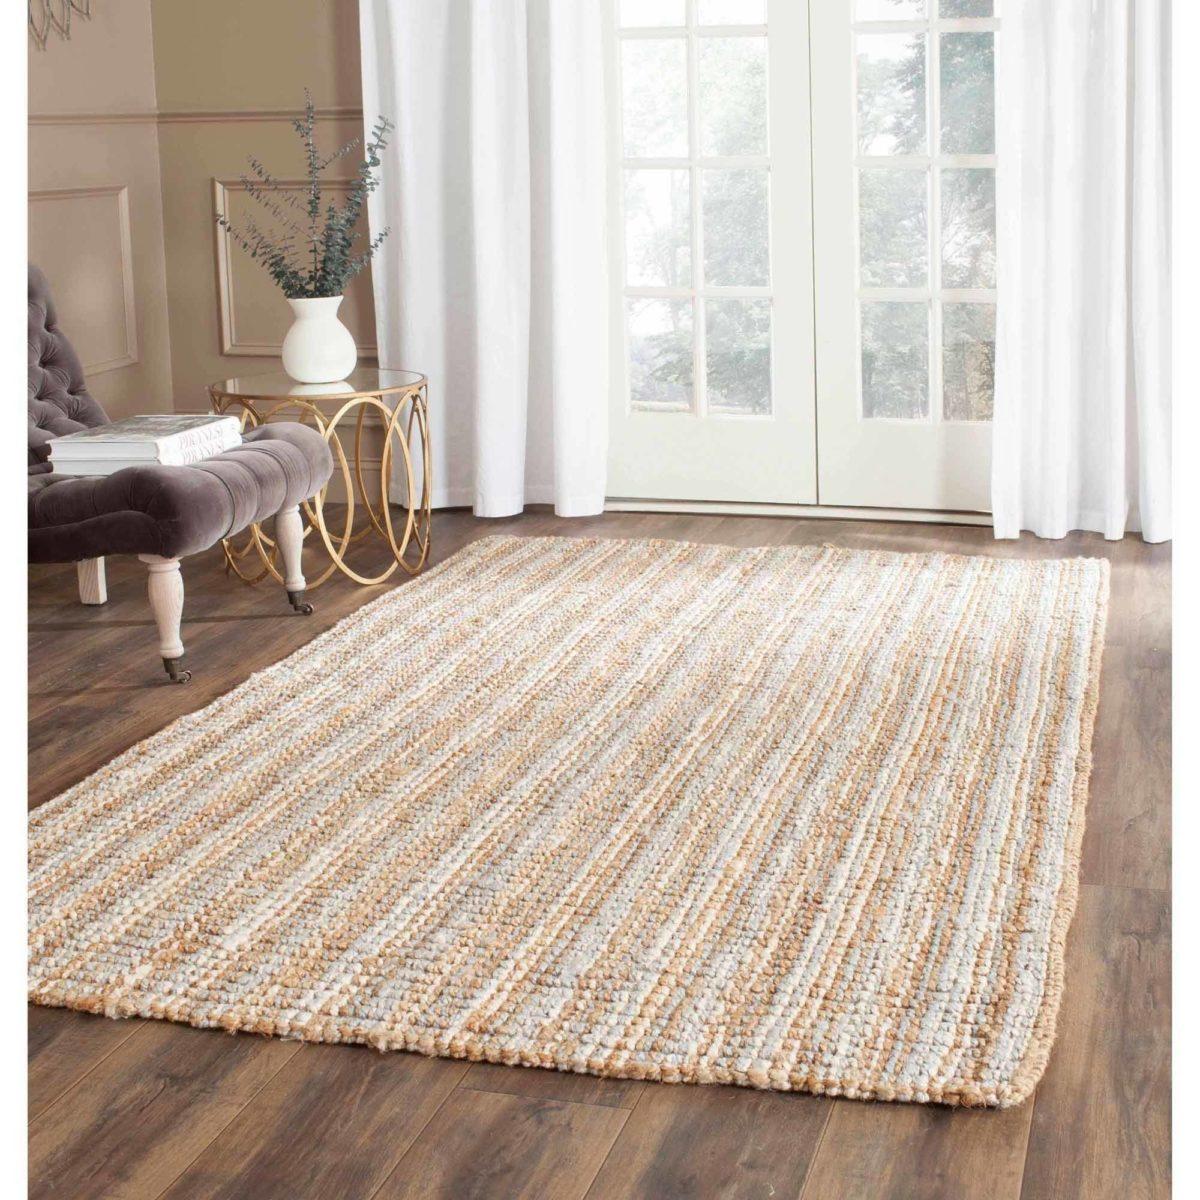 tappeto-fibra-naturale-3